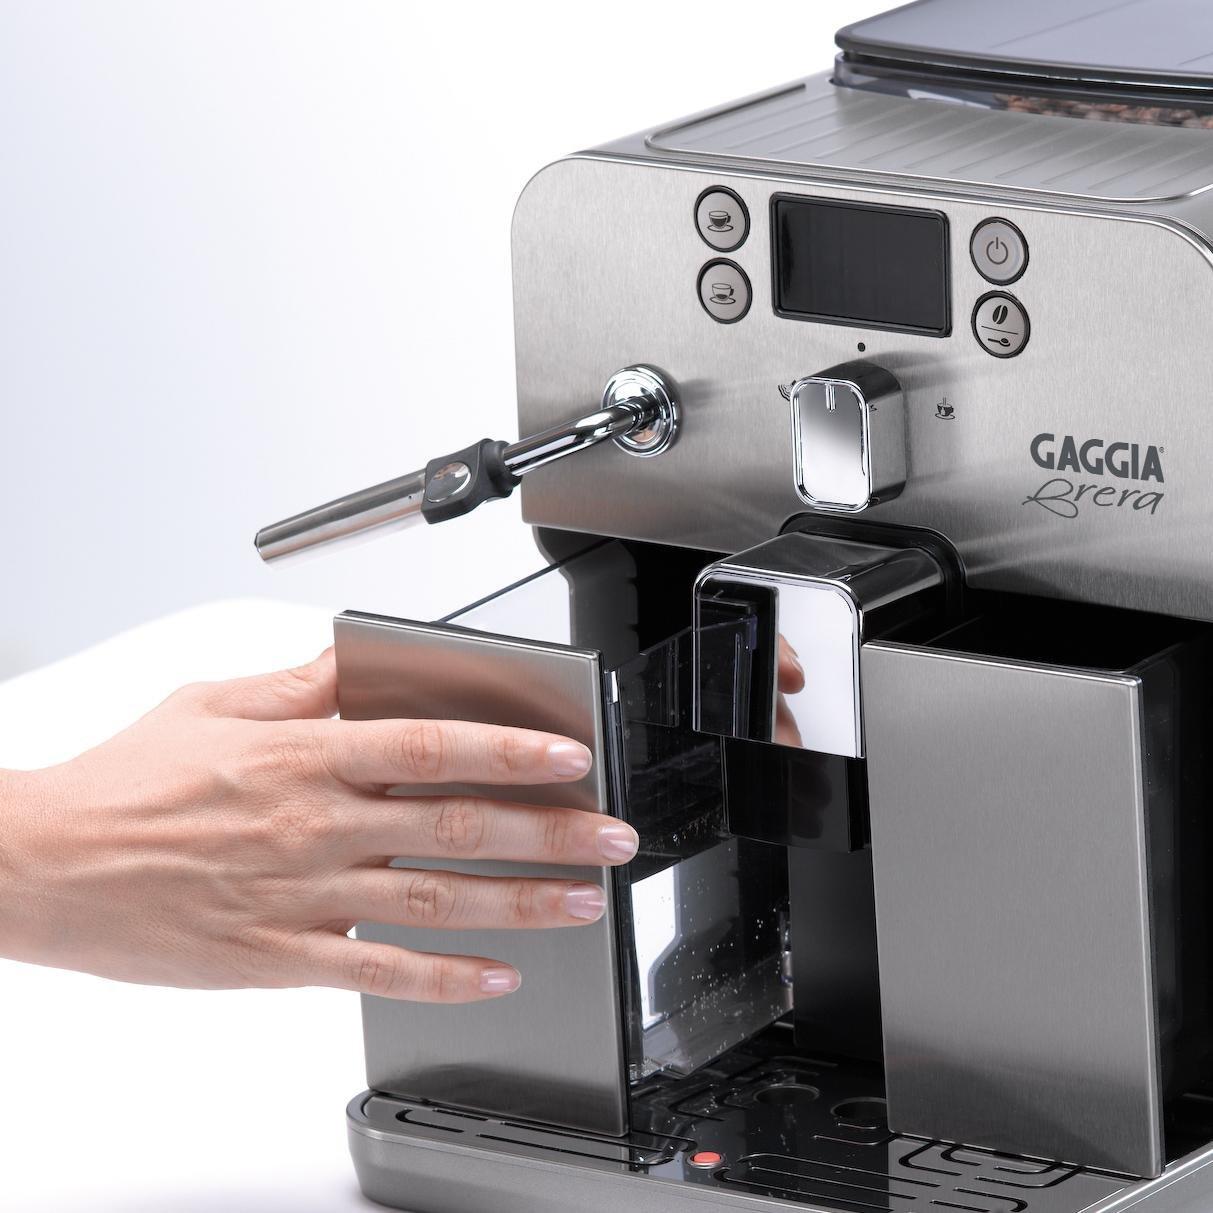 Gaggia Brera Super Automatic Espresso Machine in Silver. Pannarello Wand Frothing for Latte and Cappuccino Drinks. Espresso from Pre-Ground or Whole Bean Coffee. by Gaggia (Image #8)